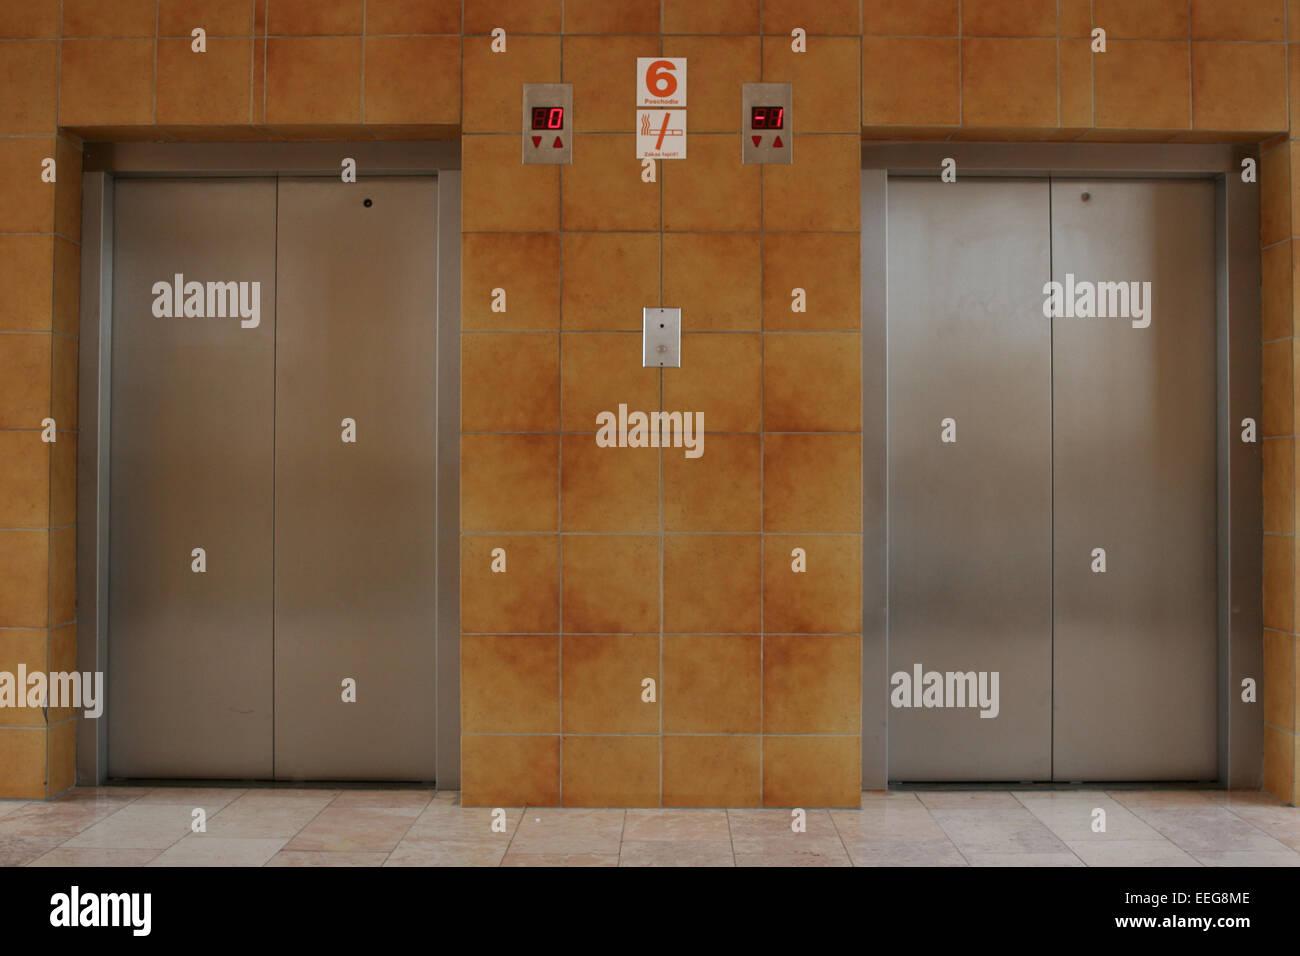 Aufzug Aufzuege Farbe Gebaeude Lift Innen Konzept Metall